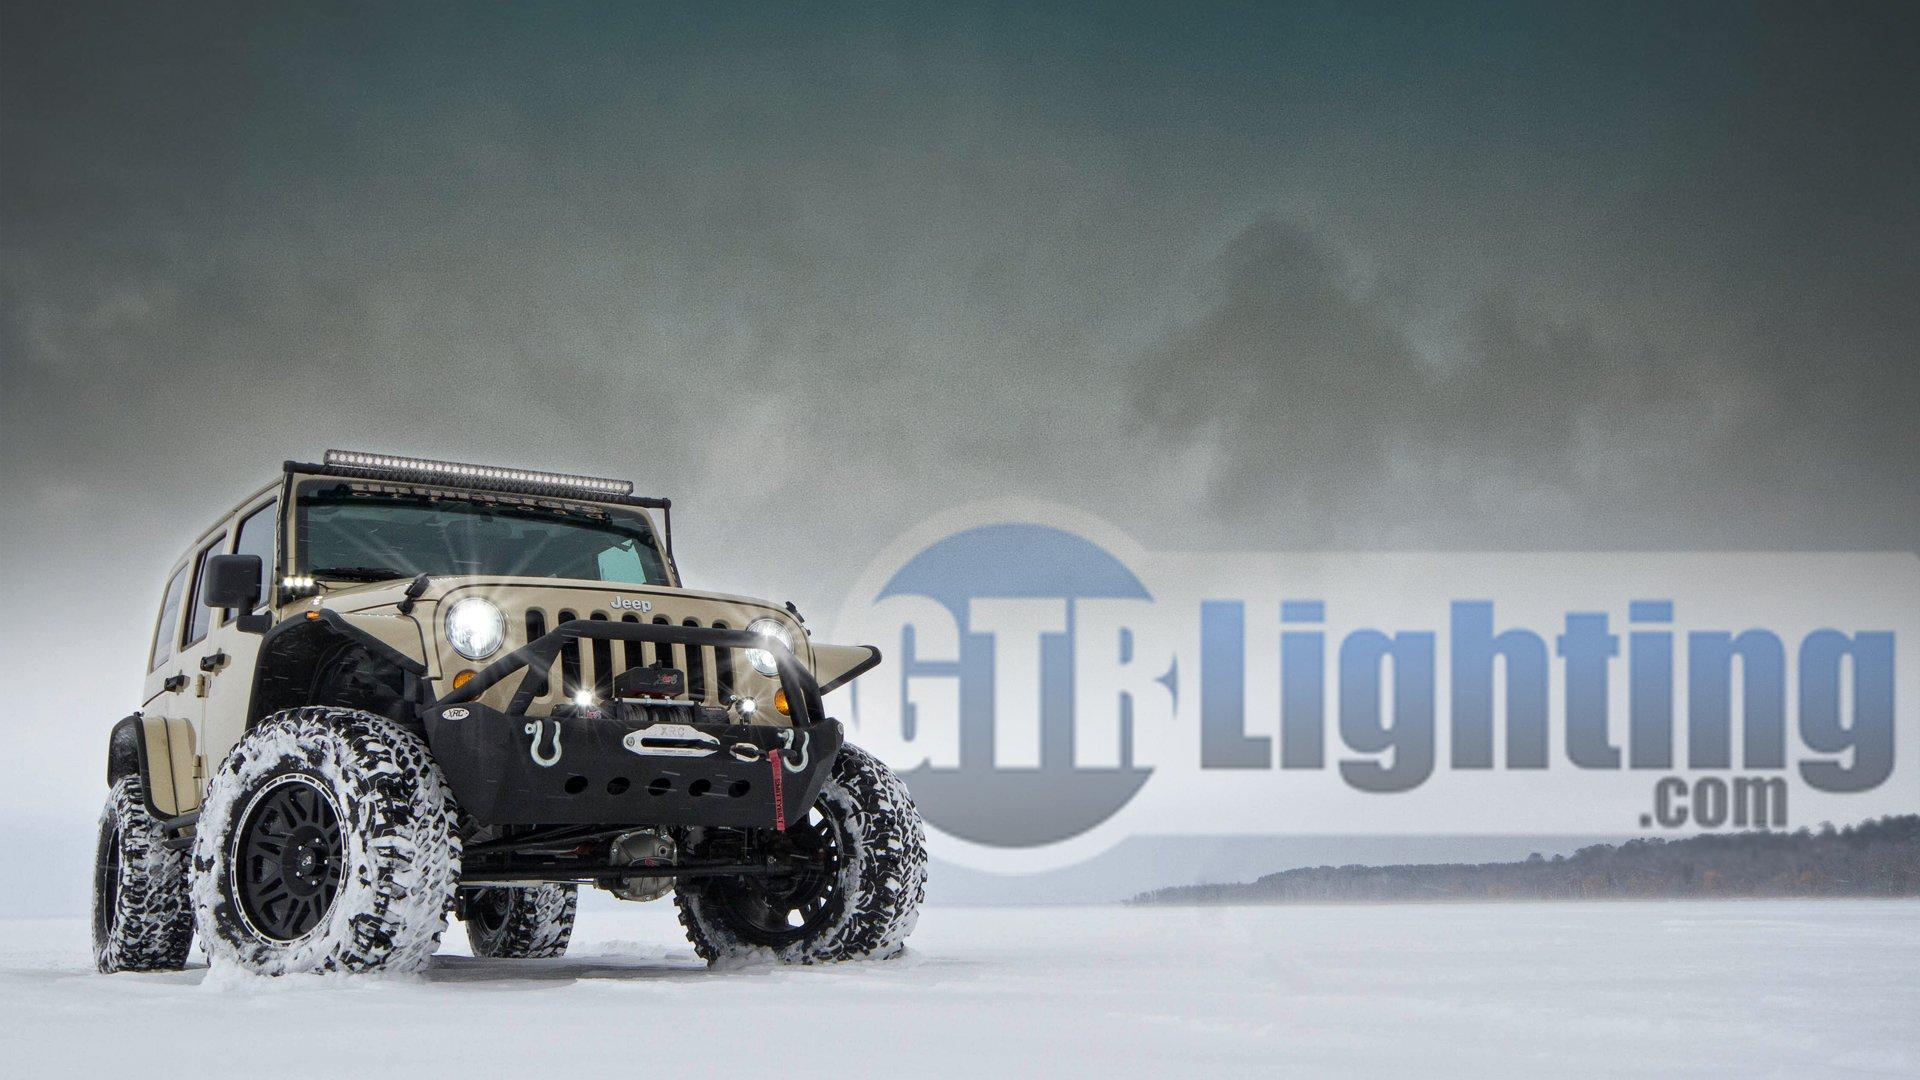 GTR Jeep Wallpaper